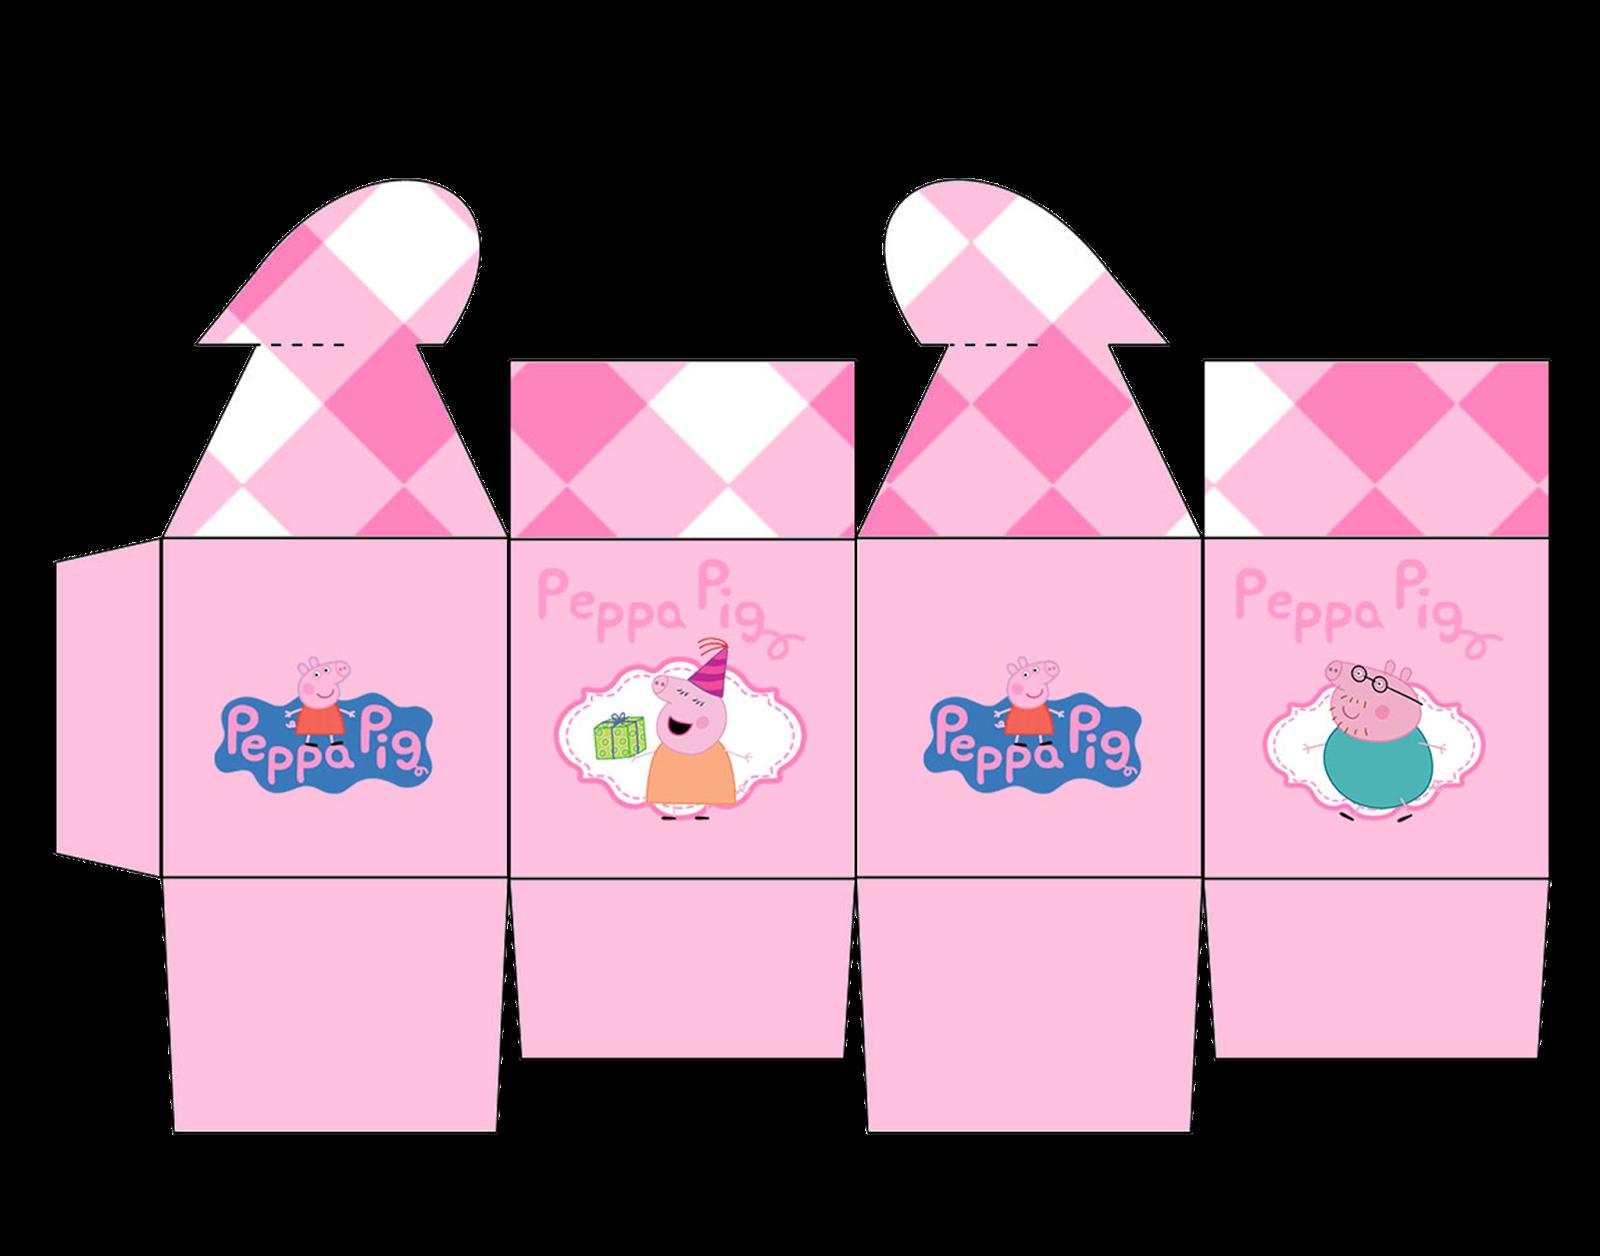 1600 x 1256 png 482kB, Peppa Pig Free Printable Box with Heart Closure ...